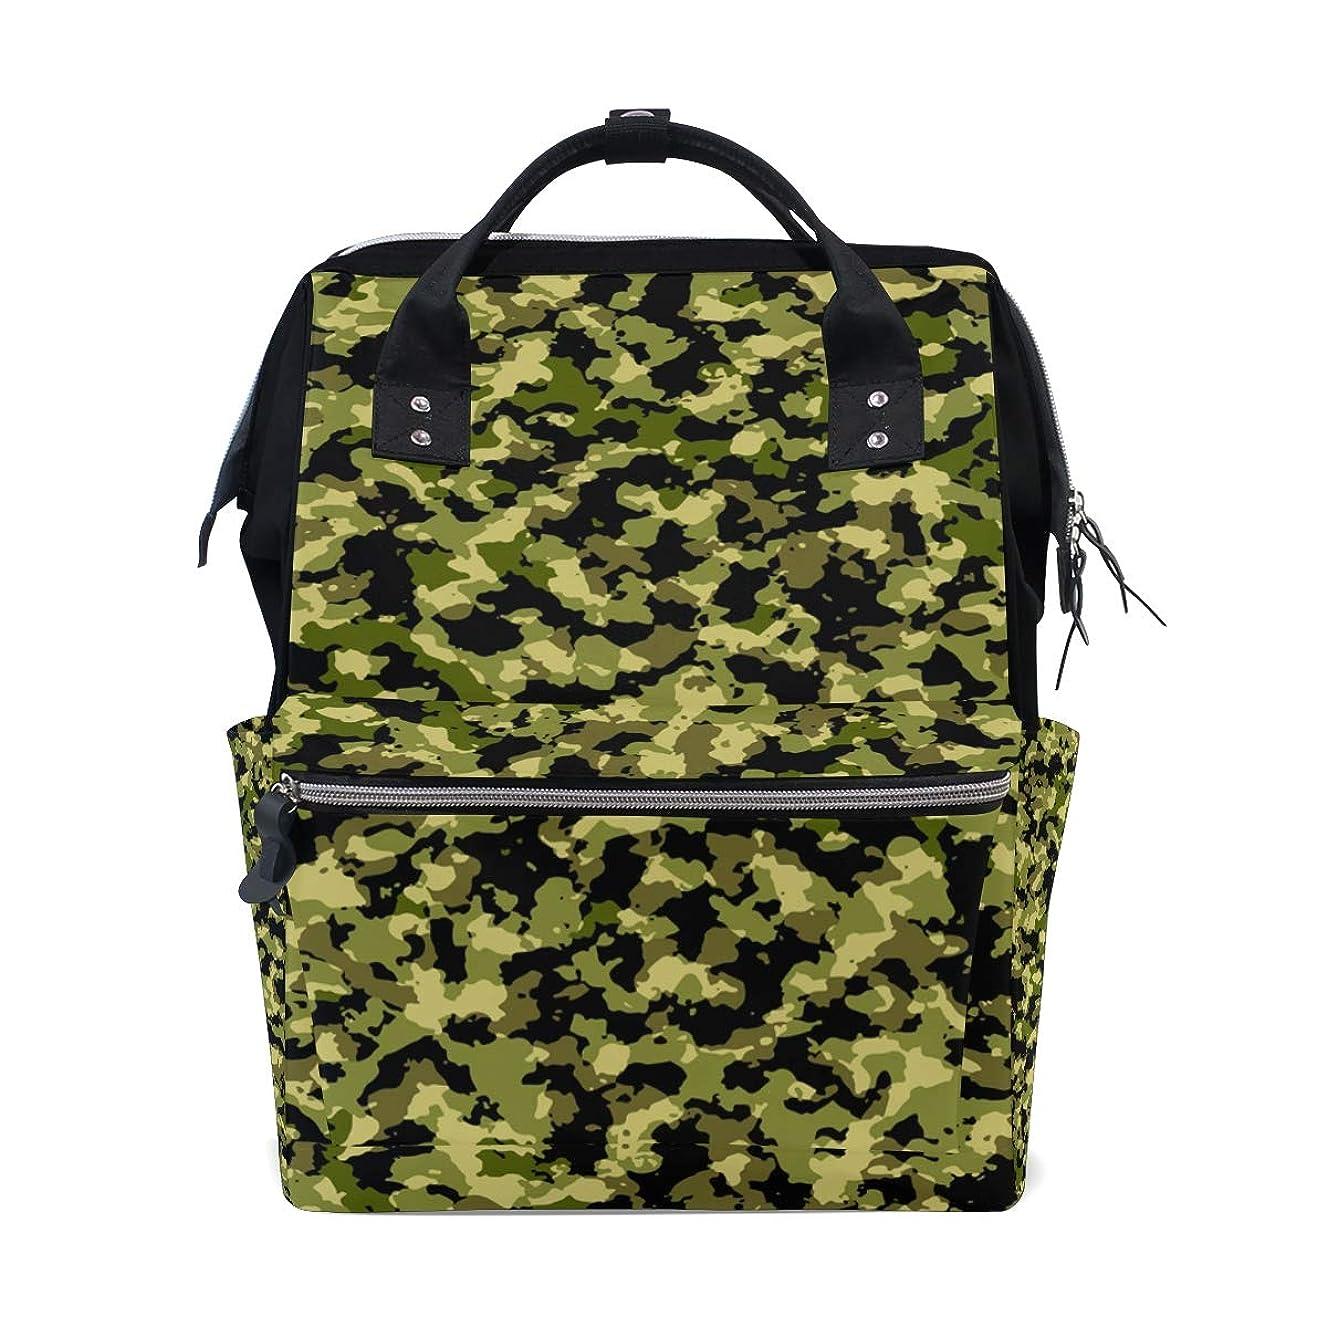 Military Multicam Pattern School Backpack Large Capacity Mummy Bags Laptop Handbag Casual Travel Rucksack Satchel For Women Men Adult Teen Children